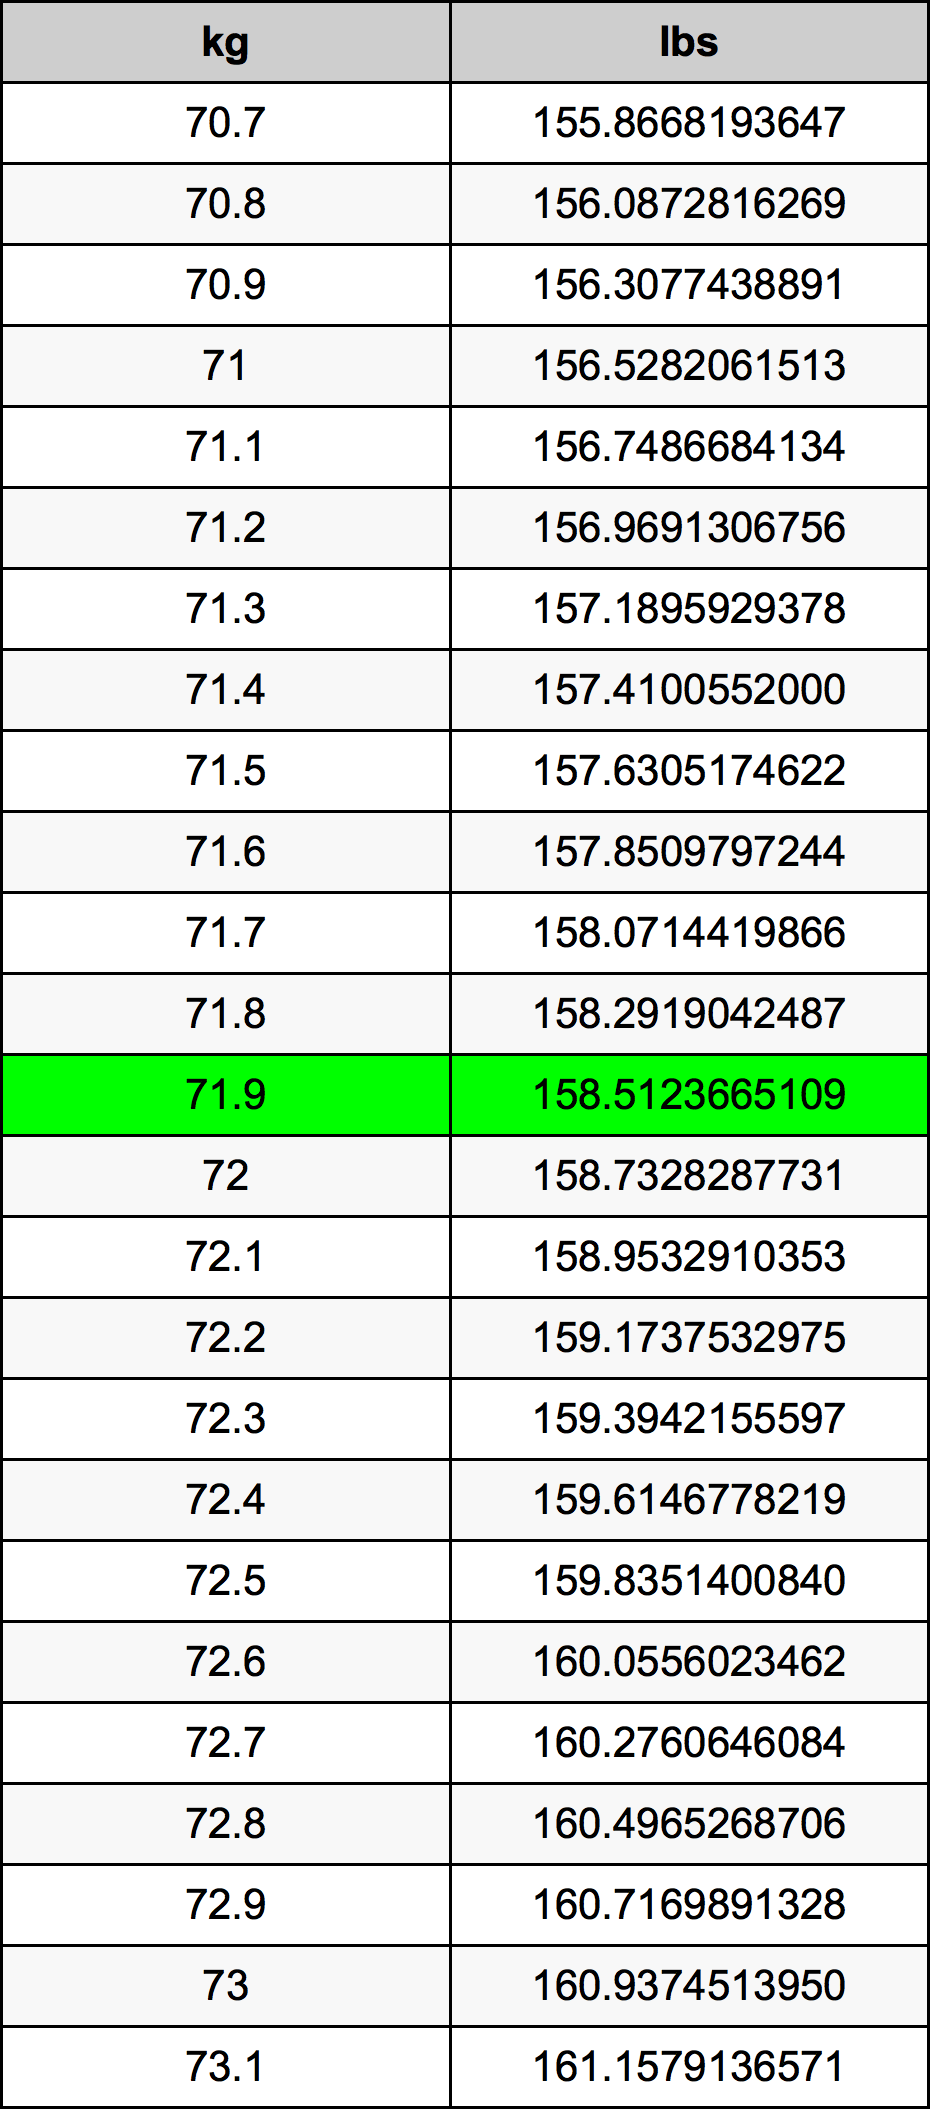 71 9 Kilograms To Pounds Converter